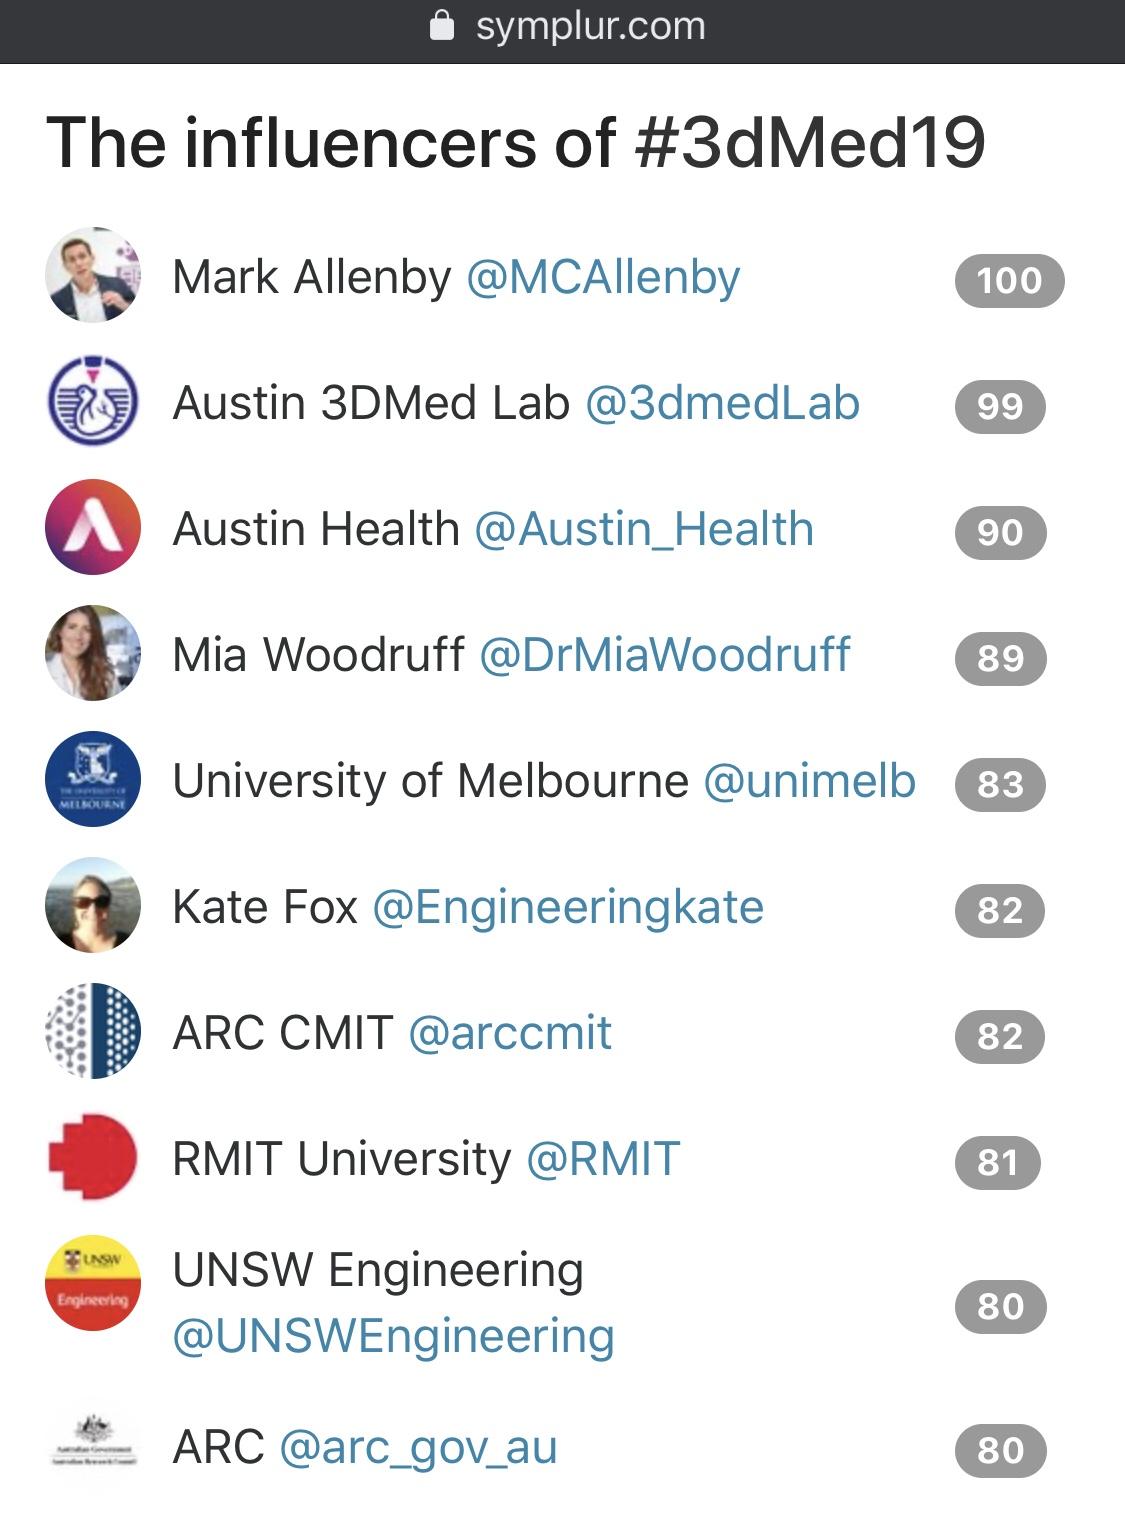 Twitter Leaderboard for #3dMed19 - courtesy Symplur